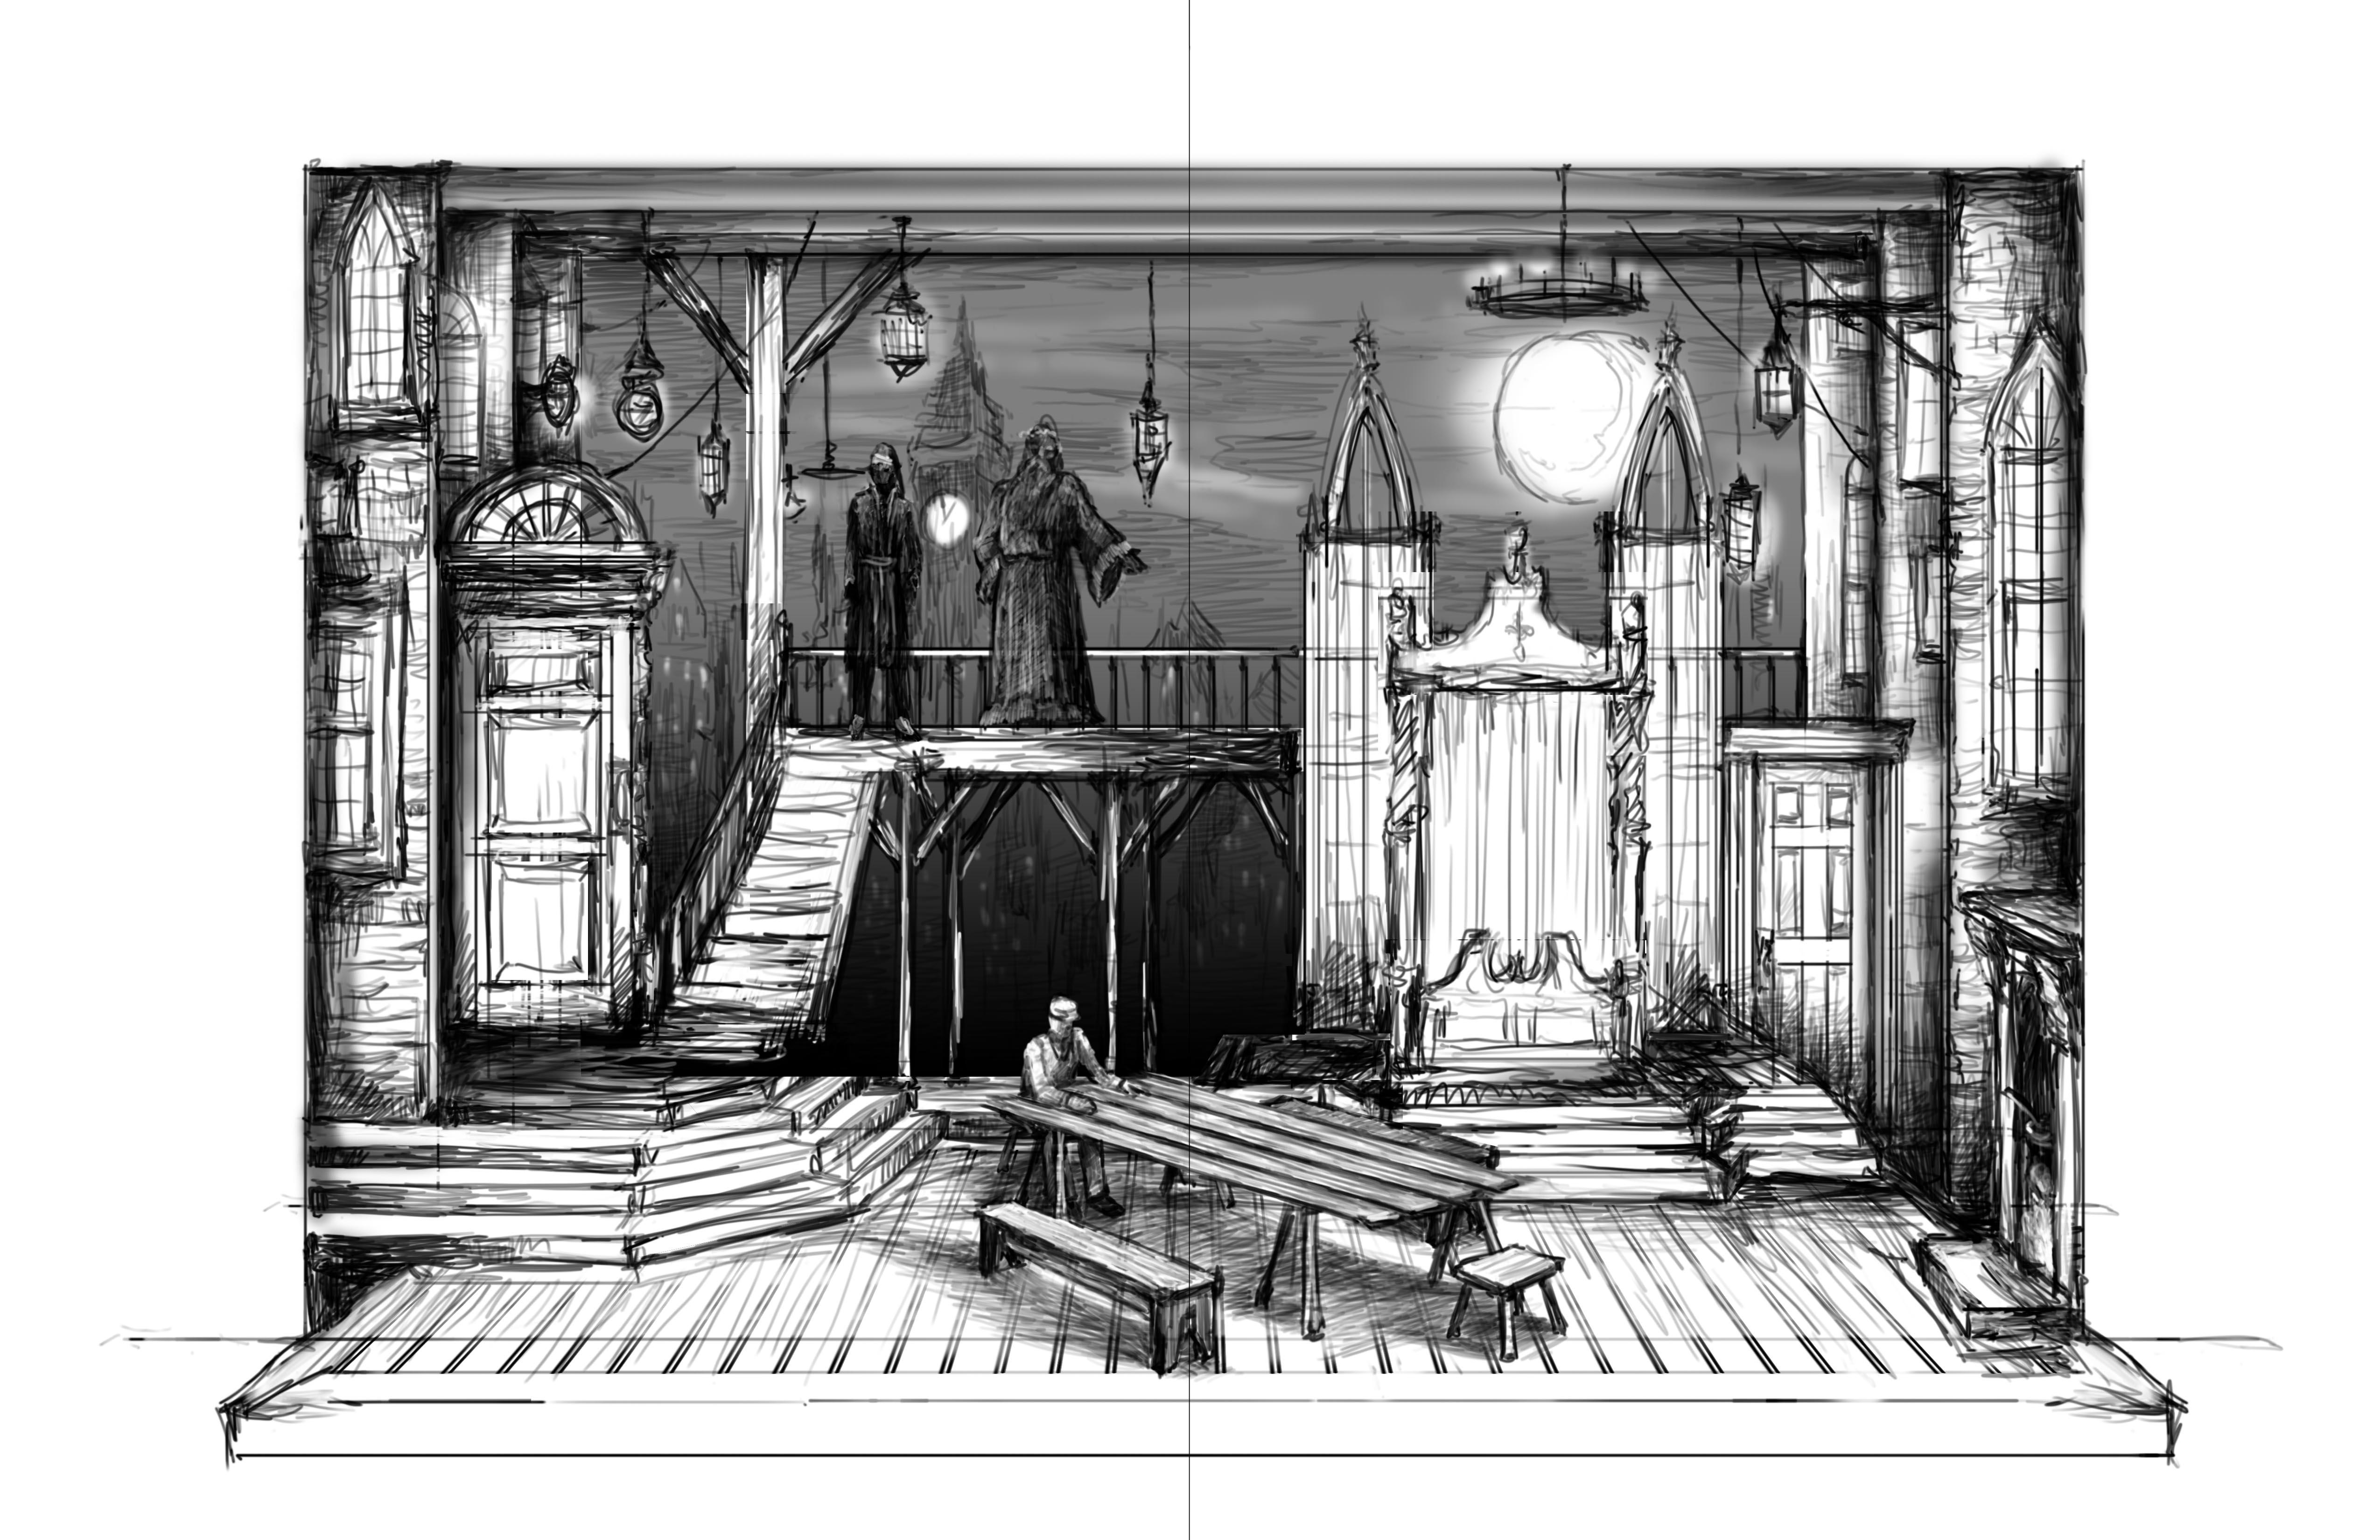 19. Cratchit's House